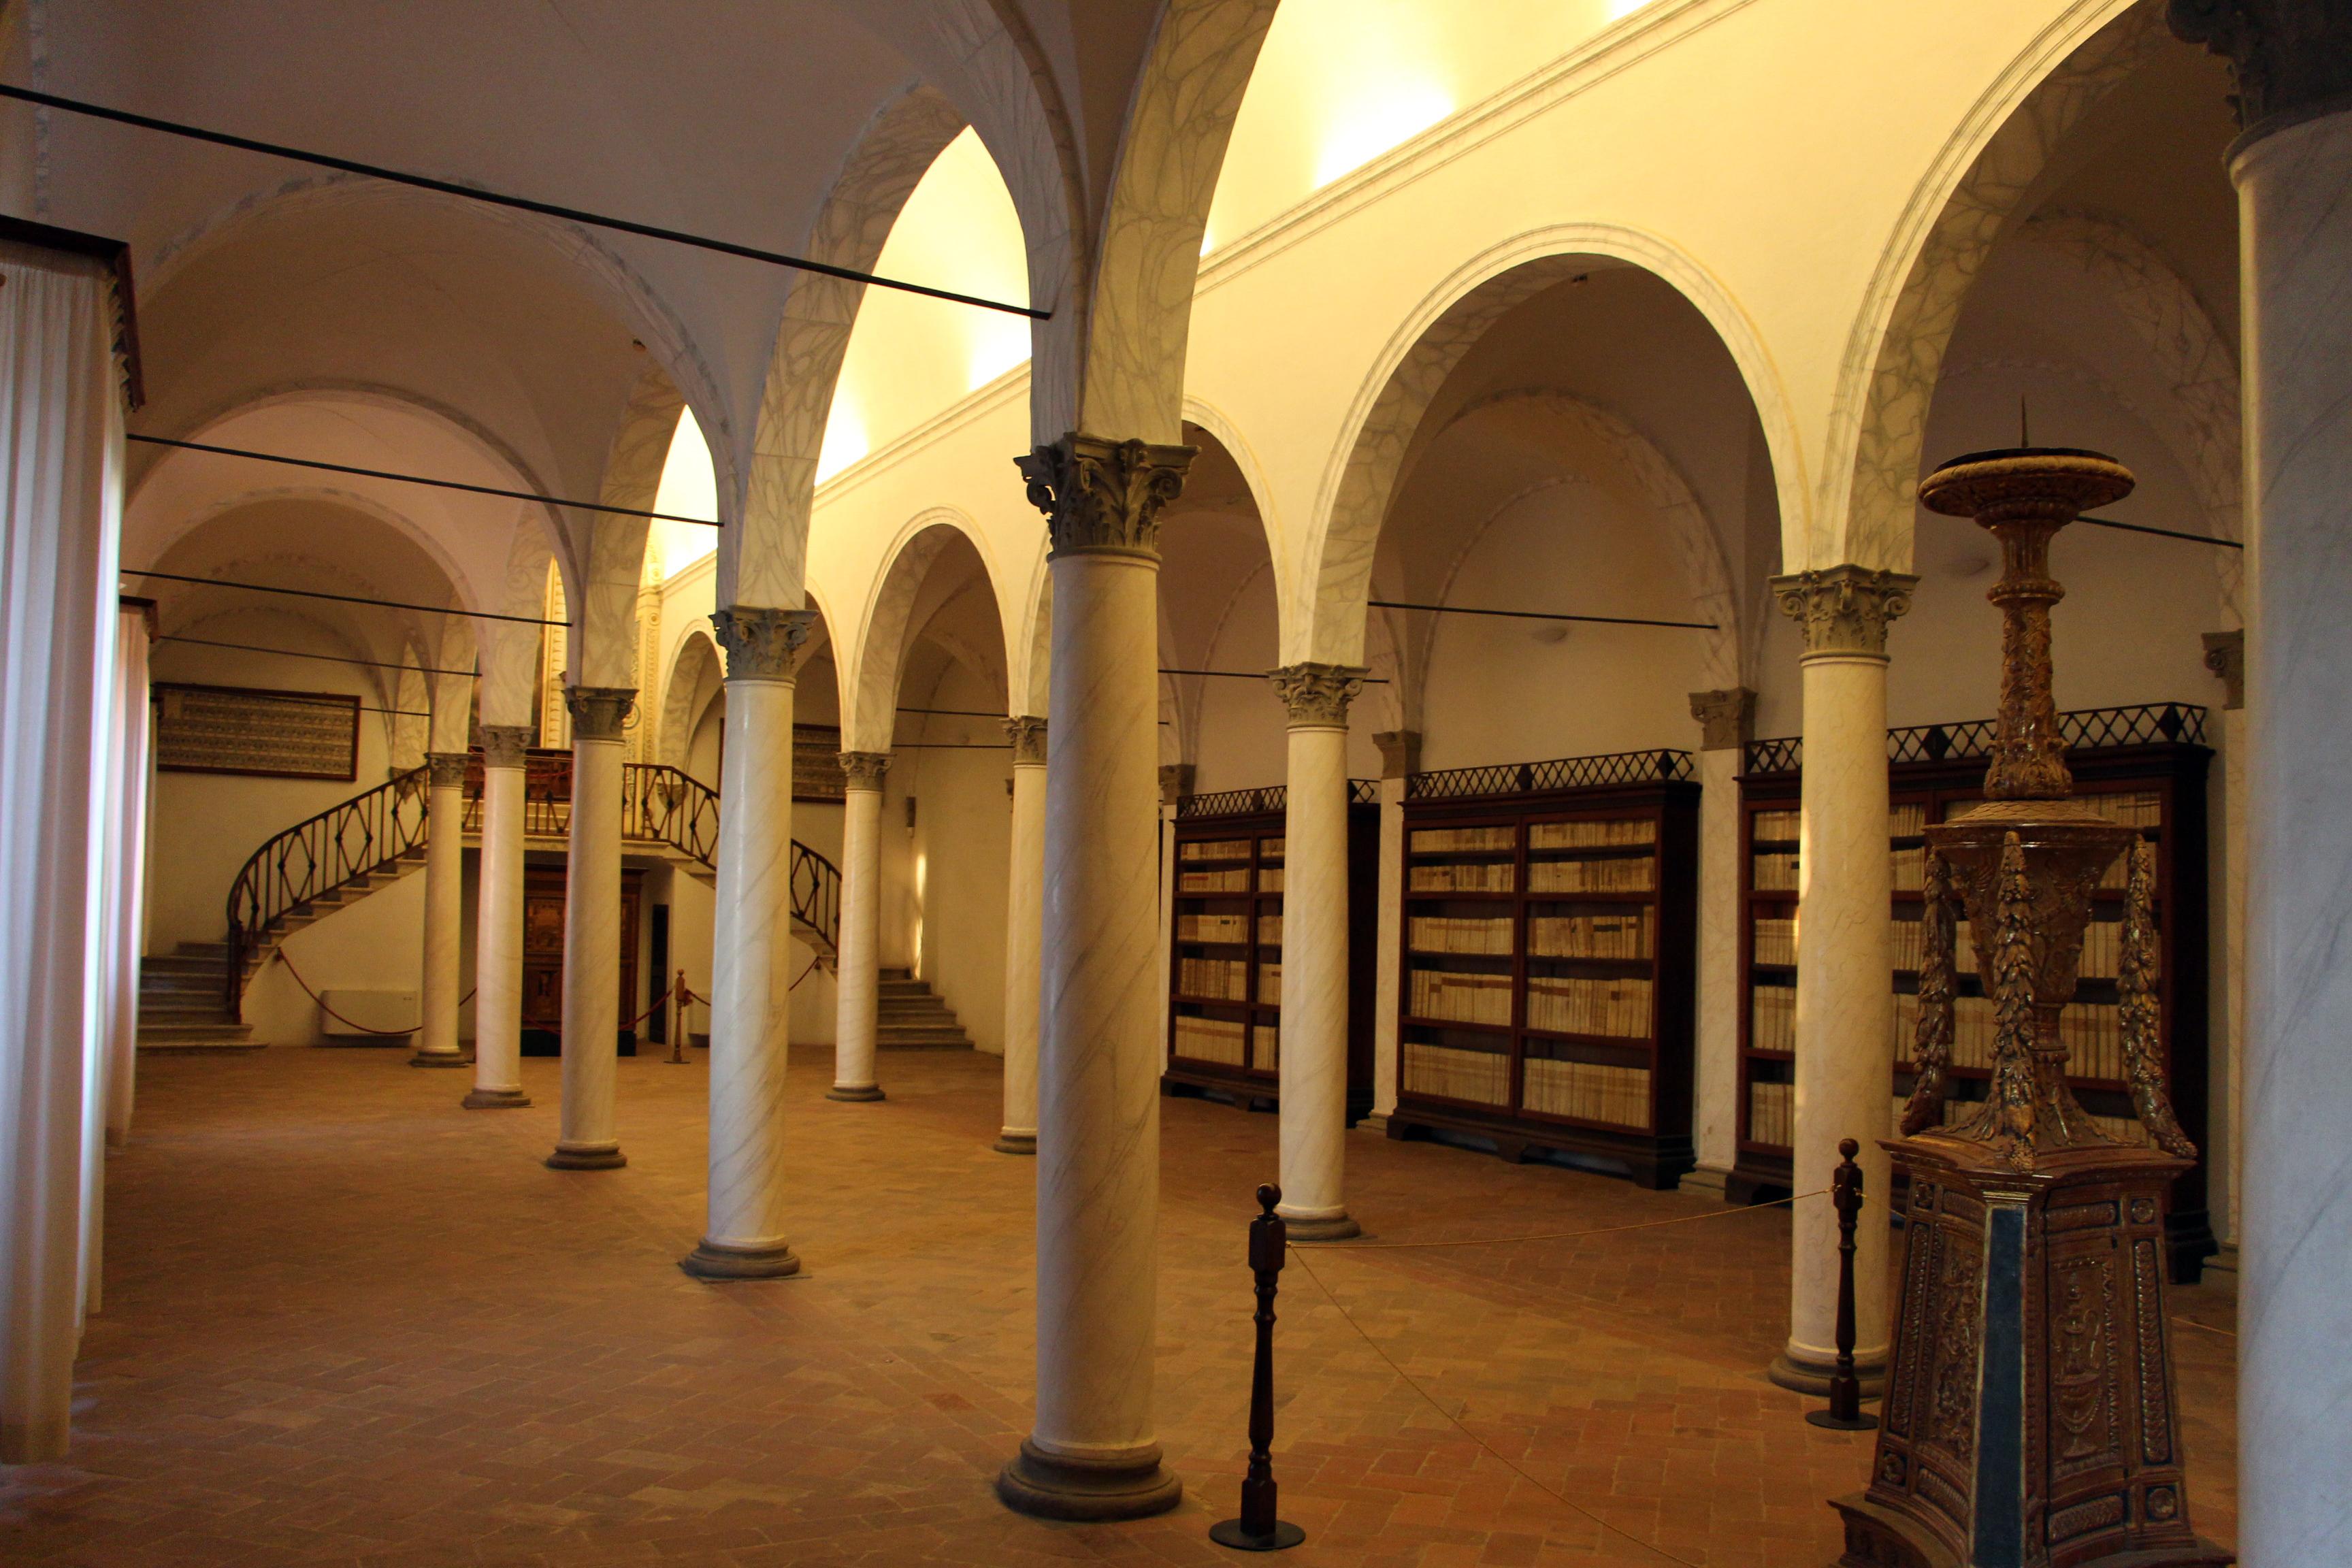 Monte oliveto maggiore, biblioteca dui fra' girolamo da verona, 1518, 03.JPG